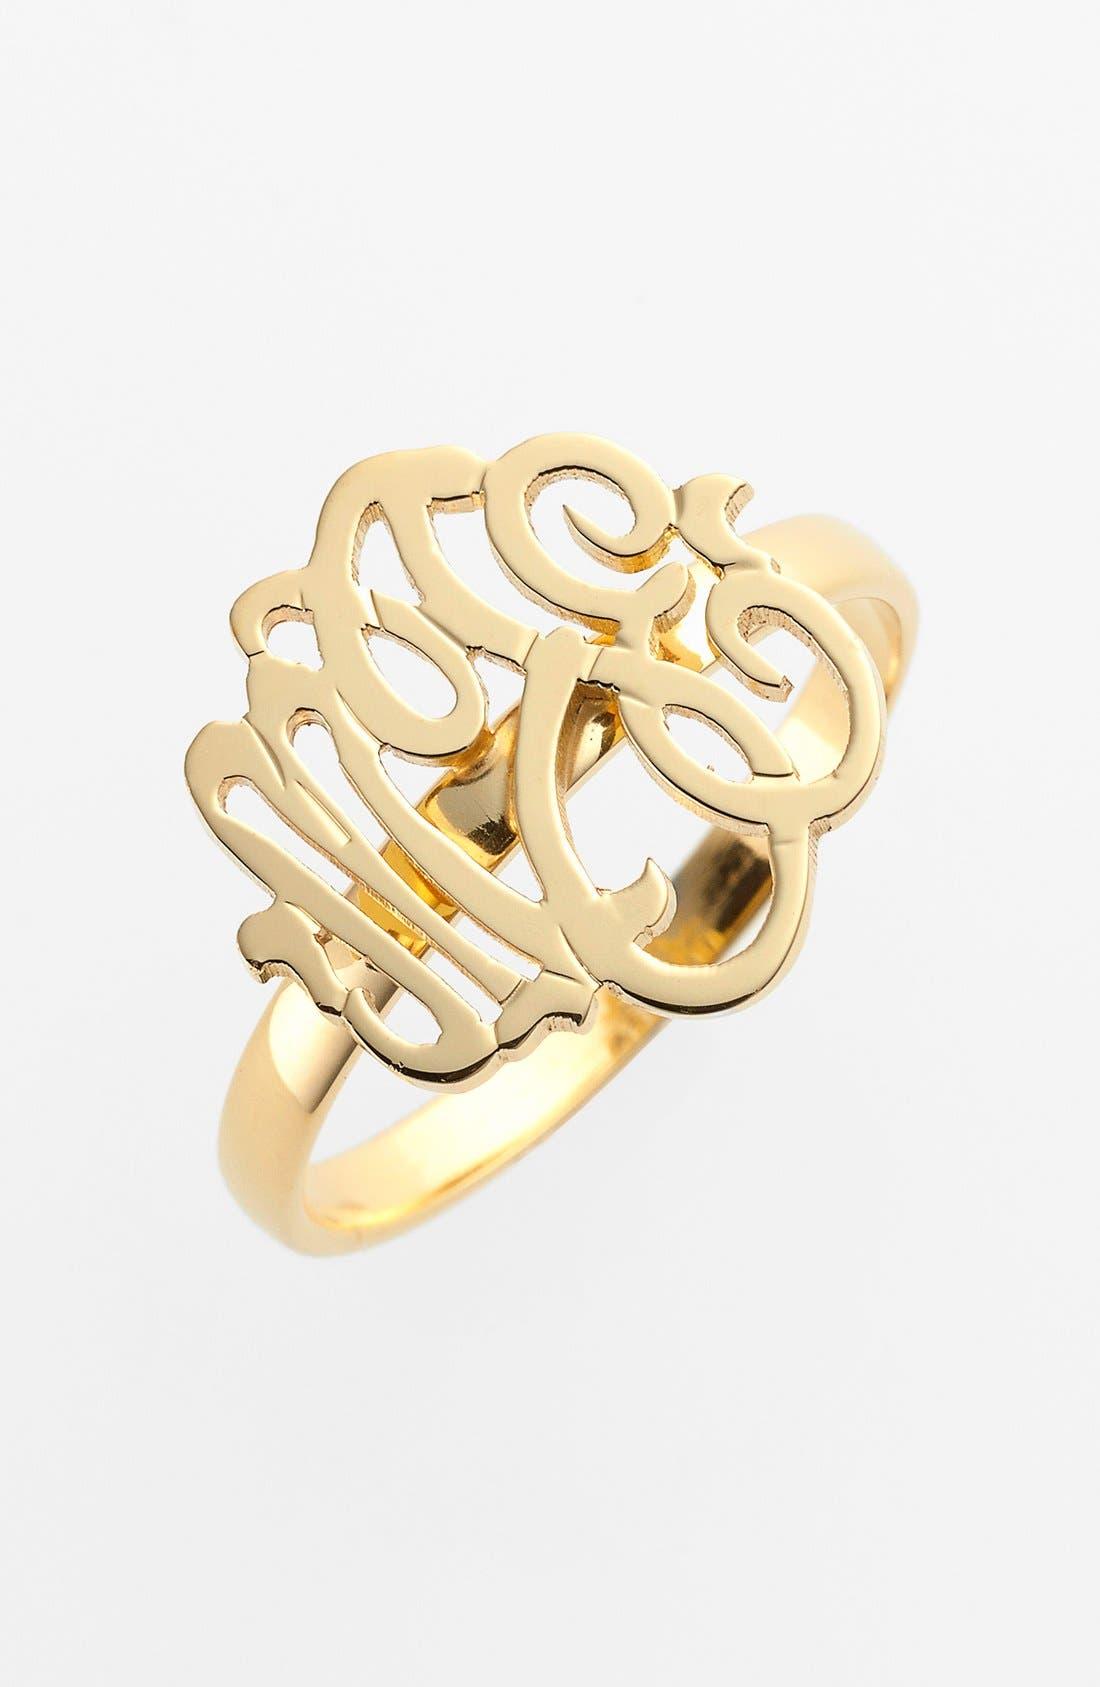 JANE BASCH DESIGNS Personalized Script Monogram Ring